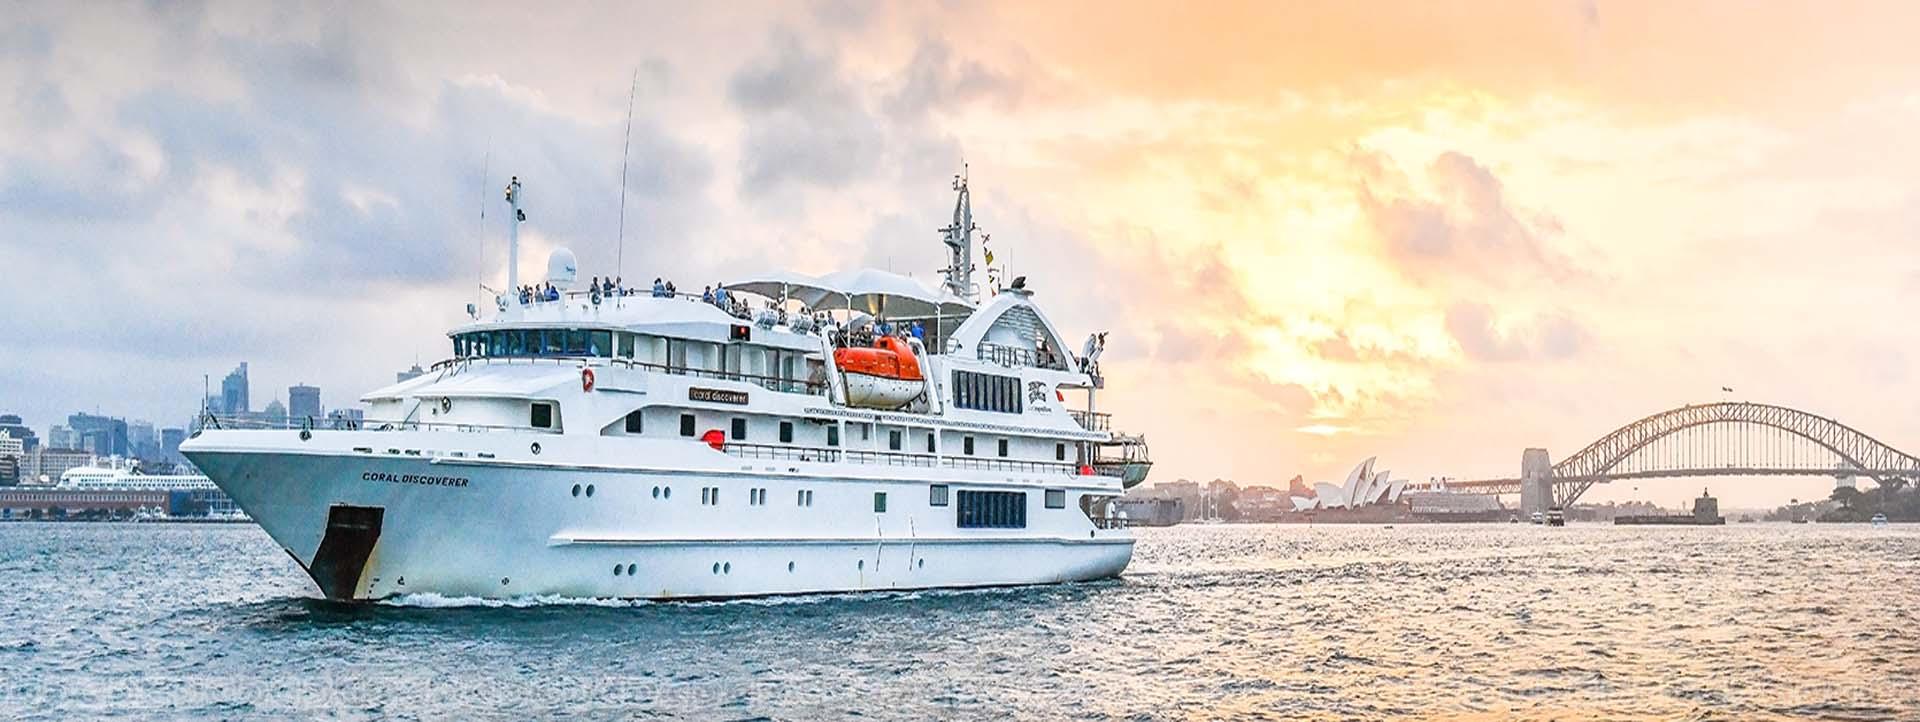 CORAL DISCOVERER sydney rocks cruise